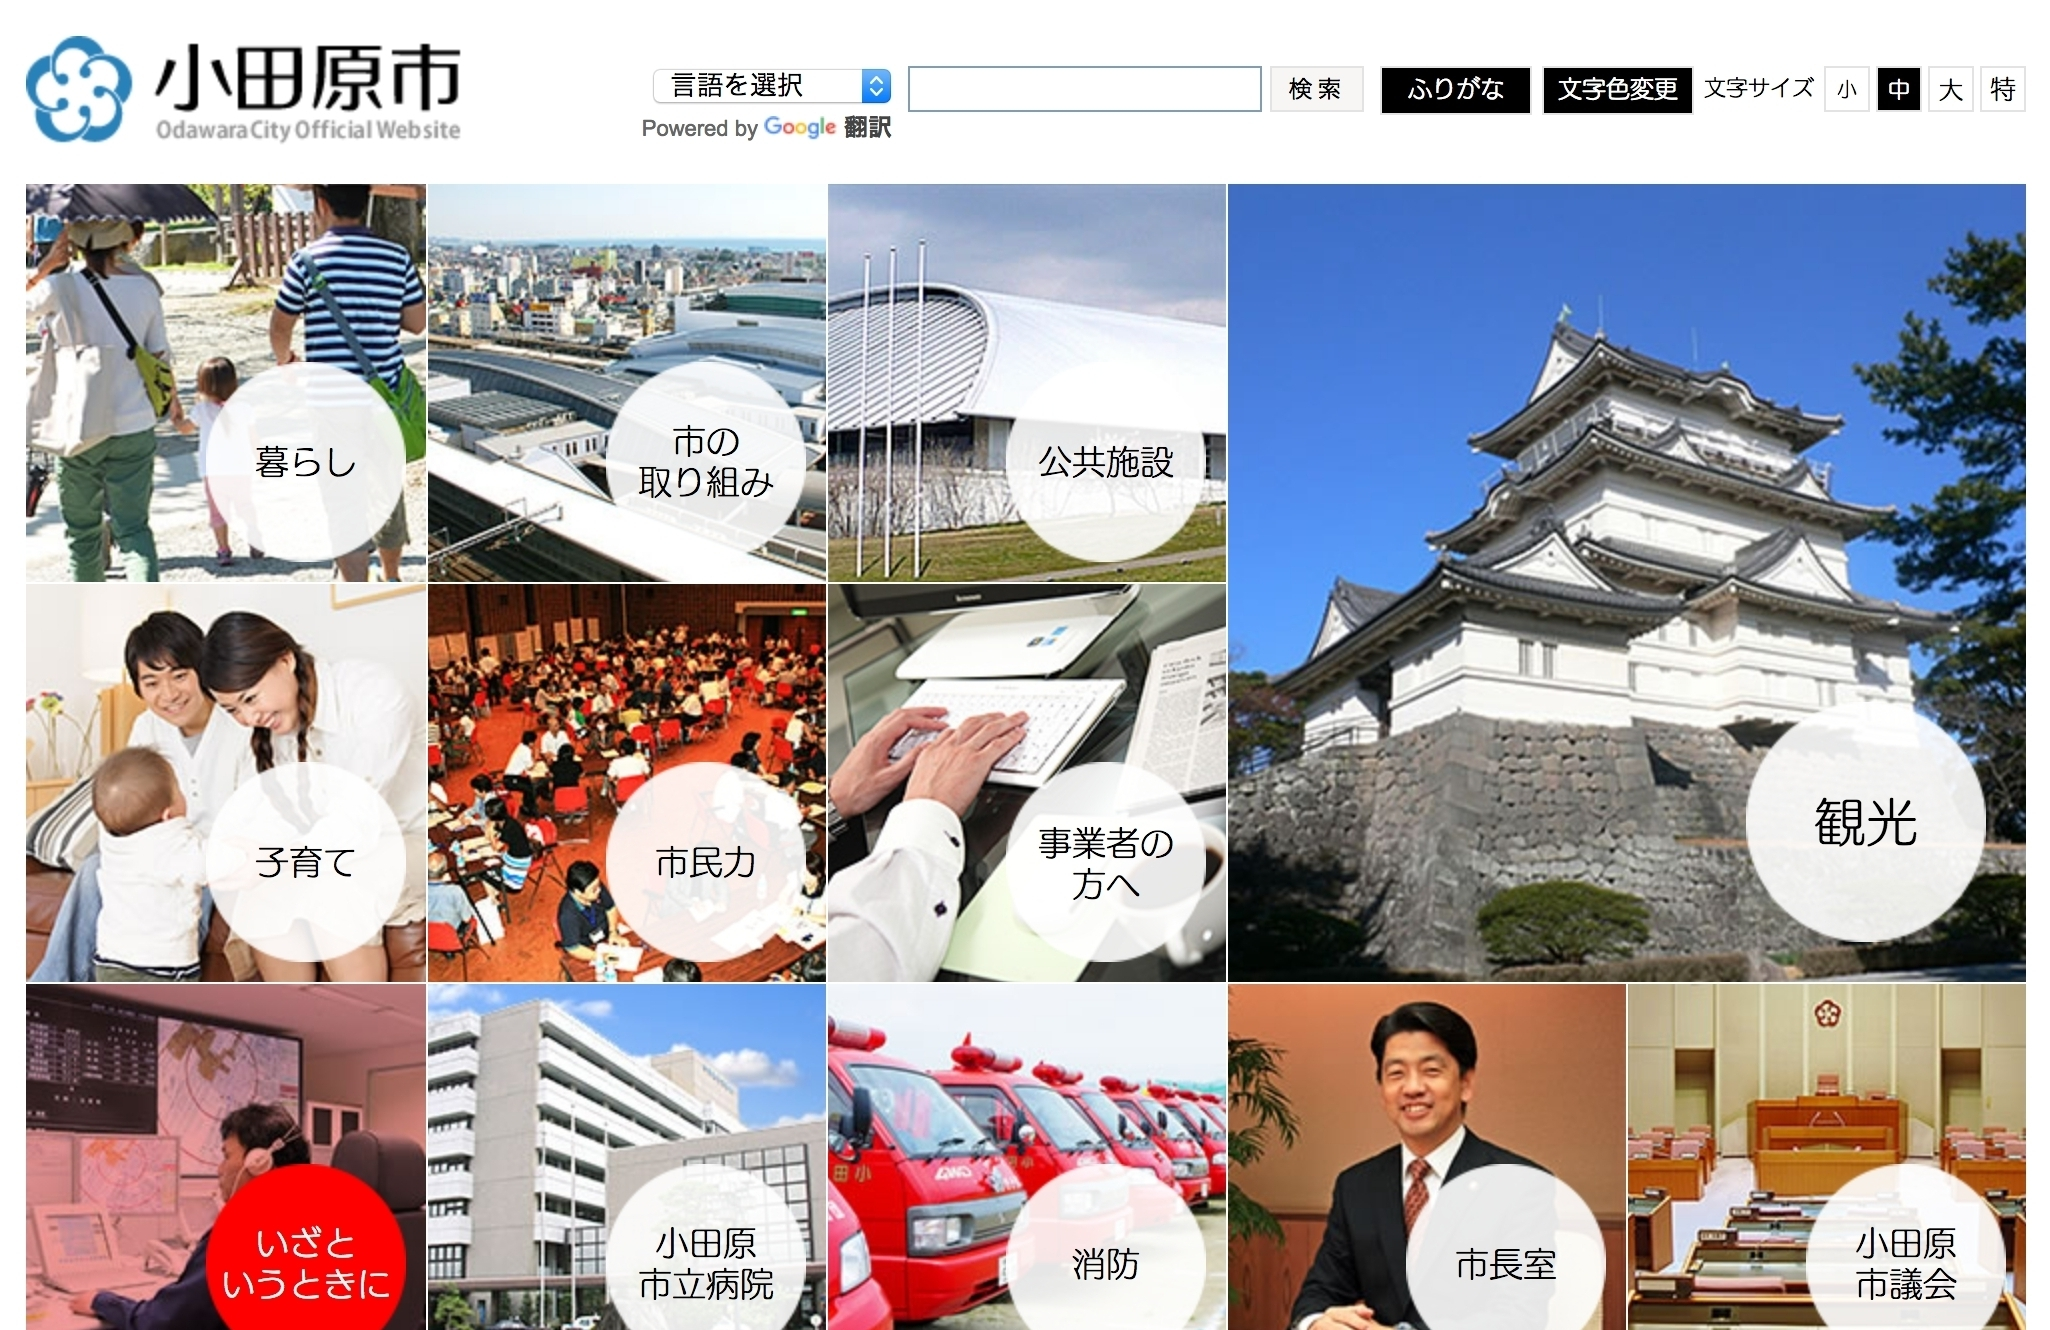 https://news.mynavi.jp/itsearch/2017/08/21/001top_2060_1330.jpg